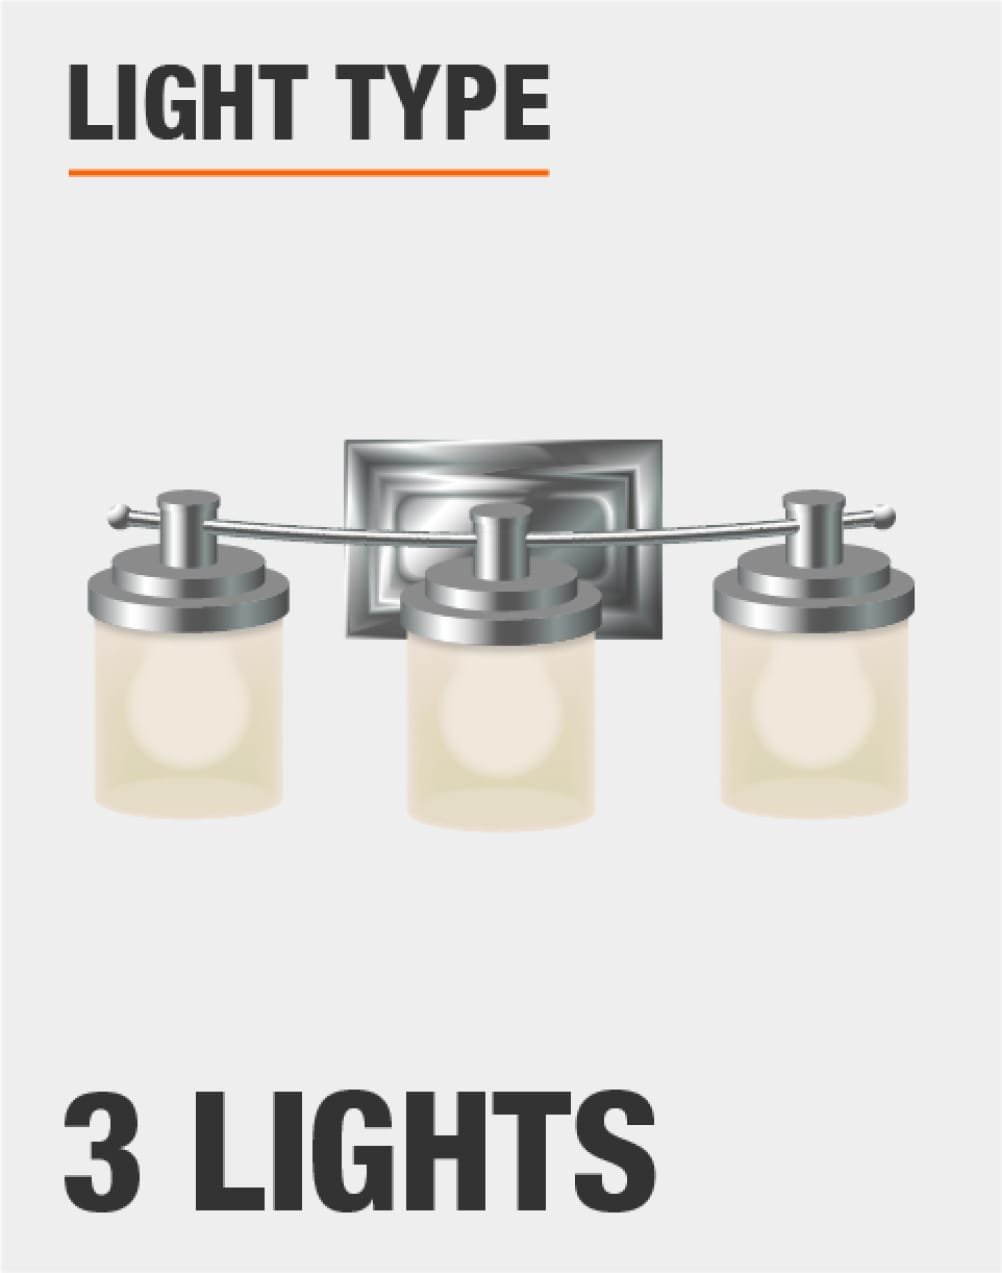 fixture has three lights